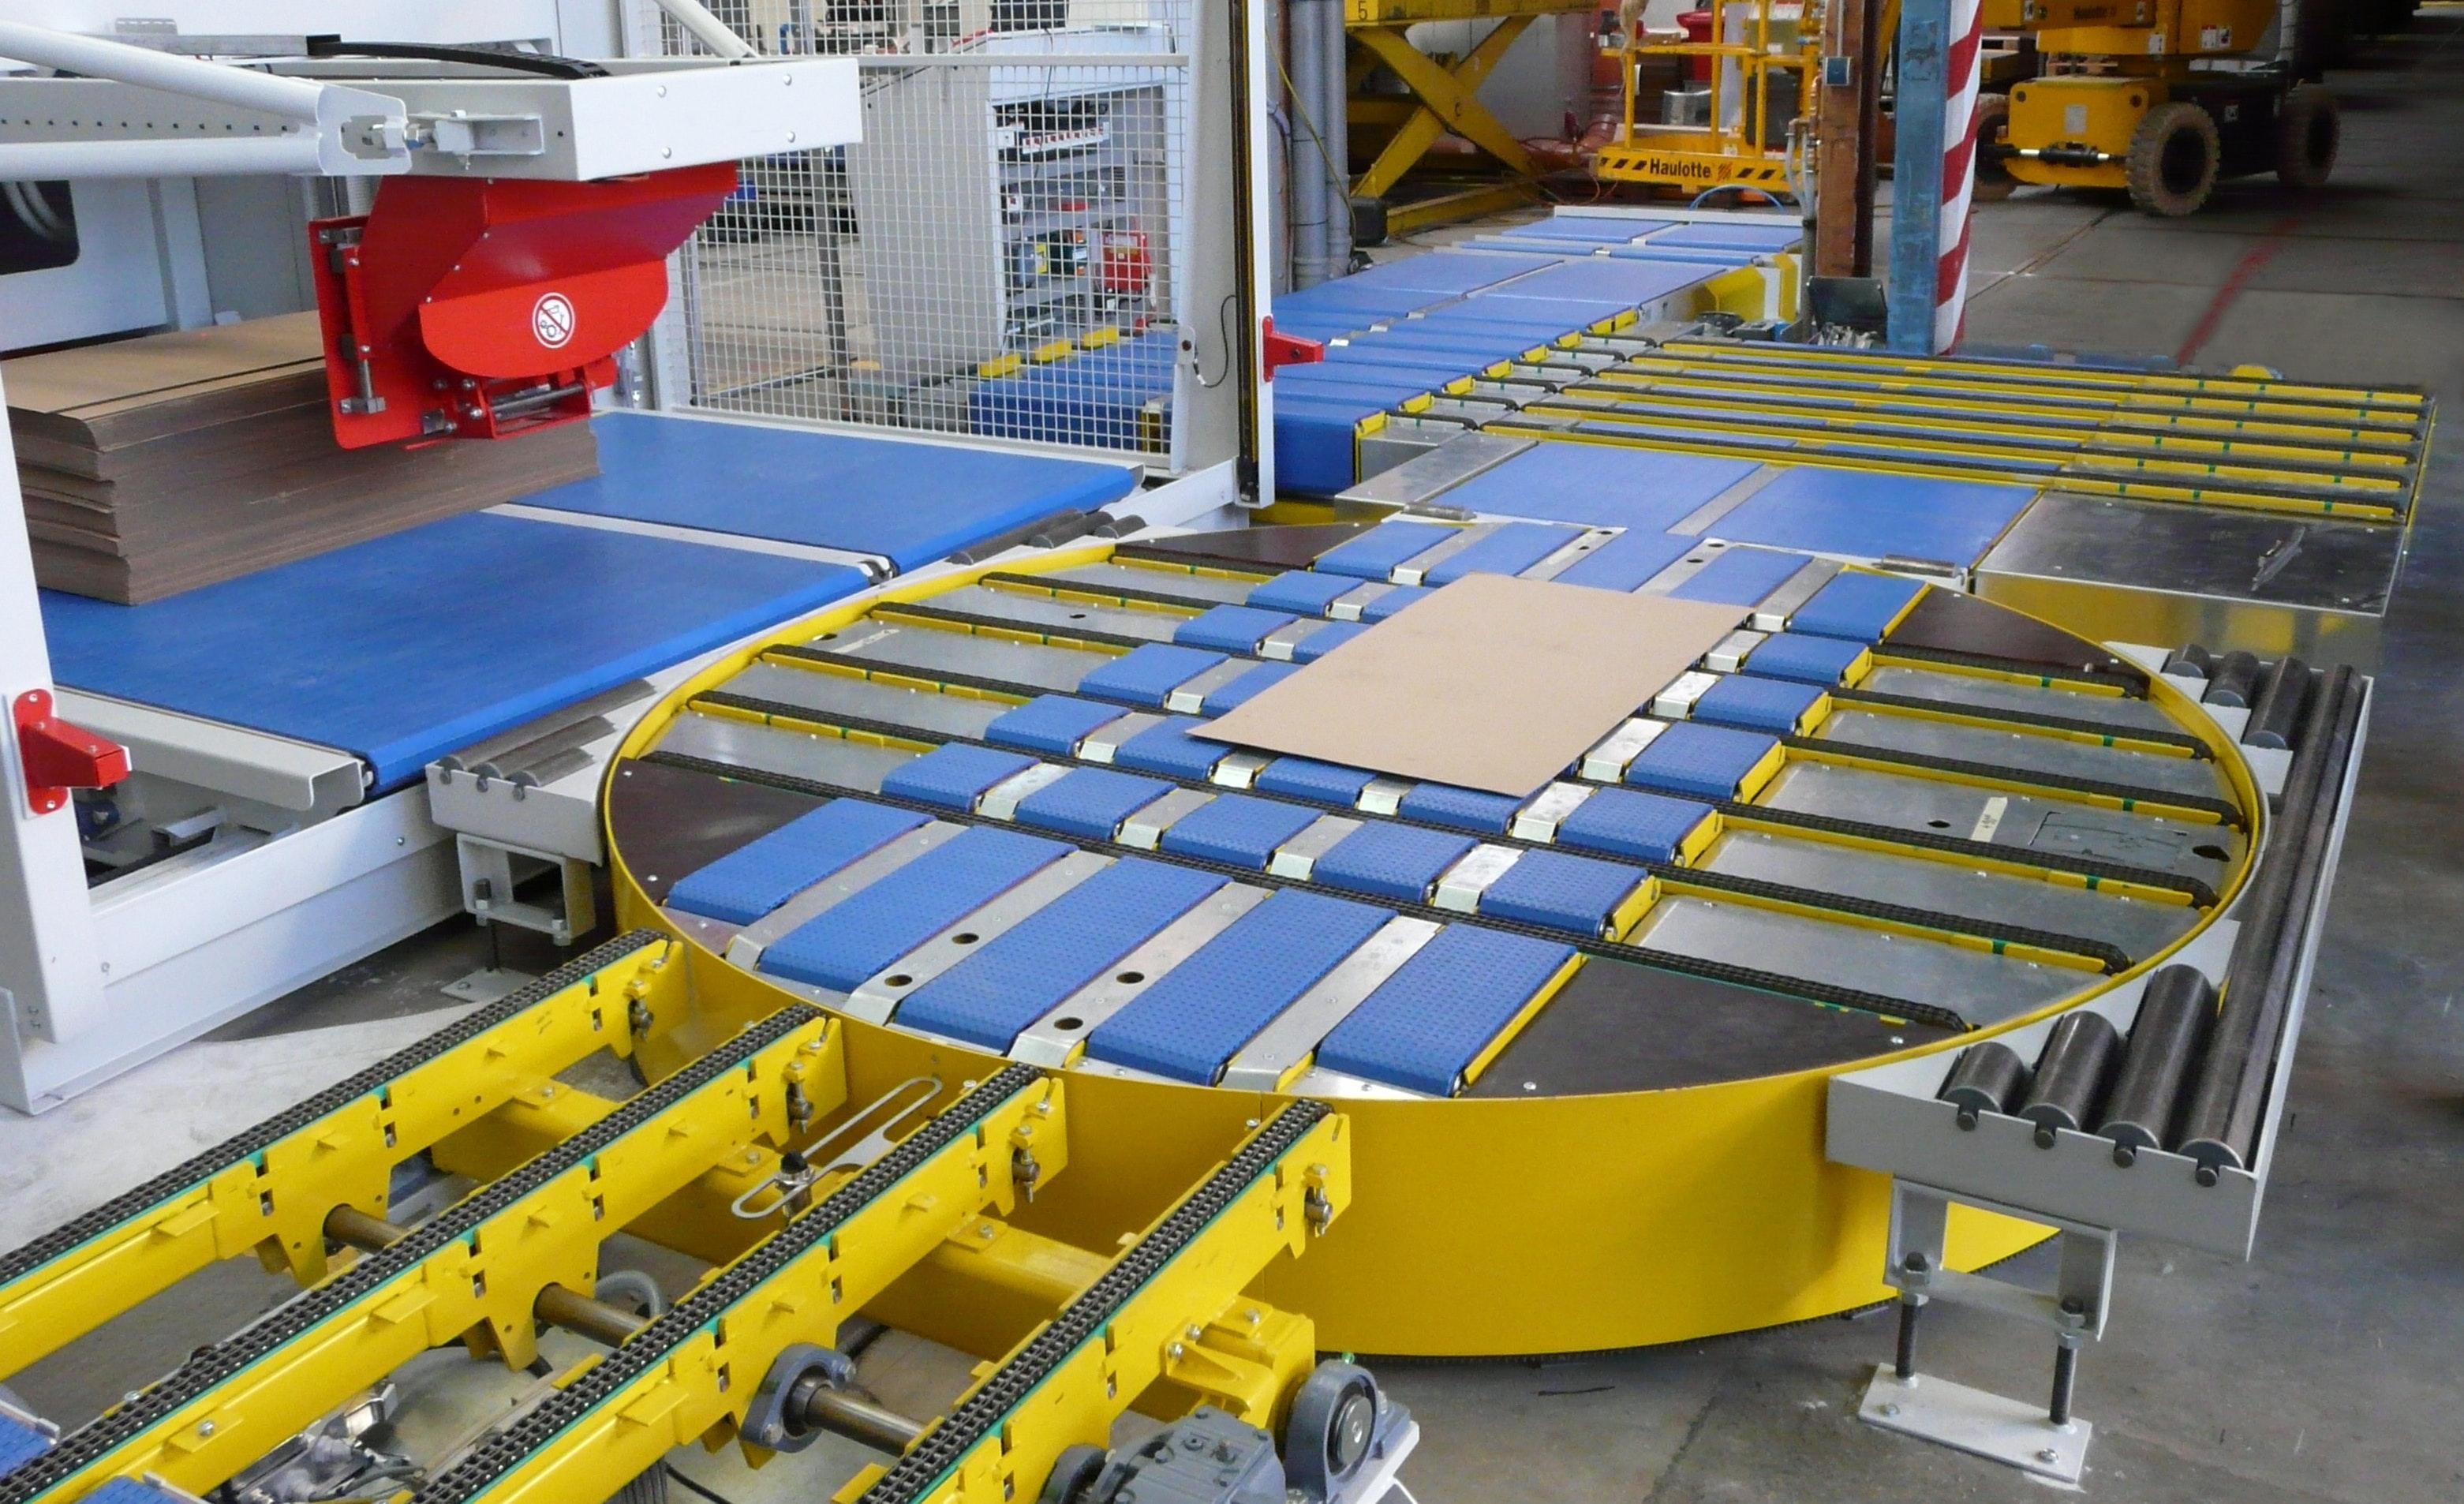 Turntable with plastic chain conveyor and angular transfer